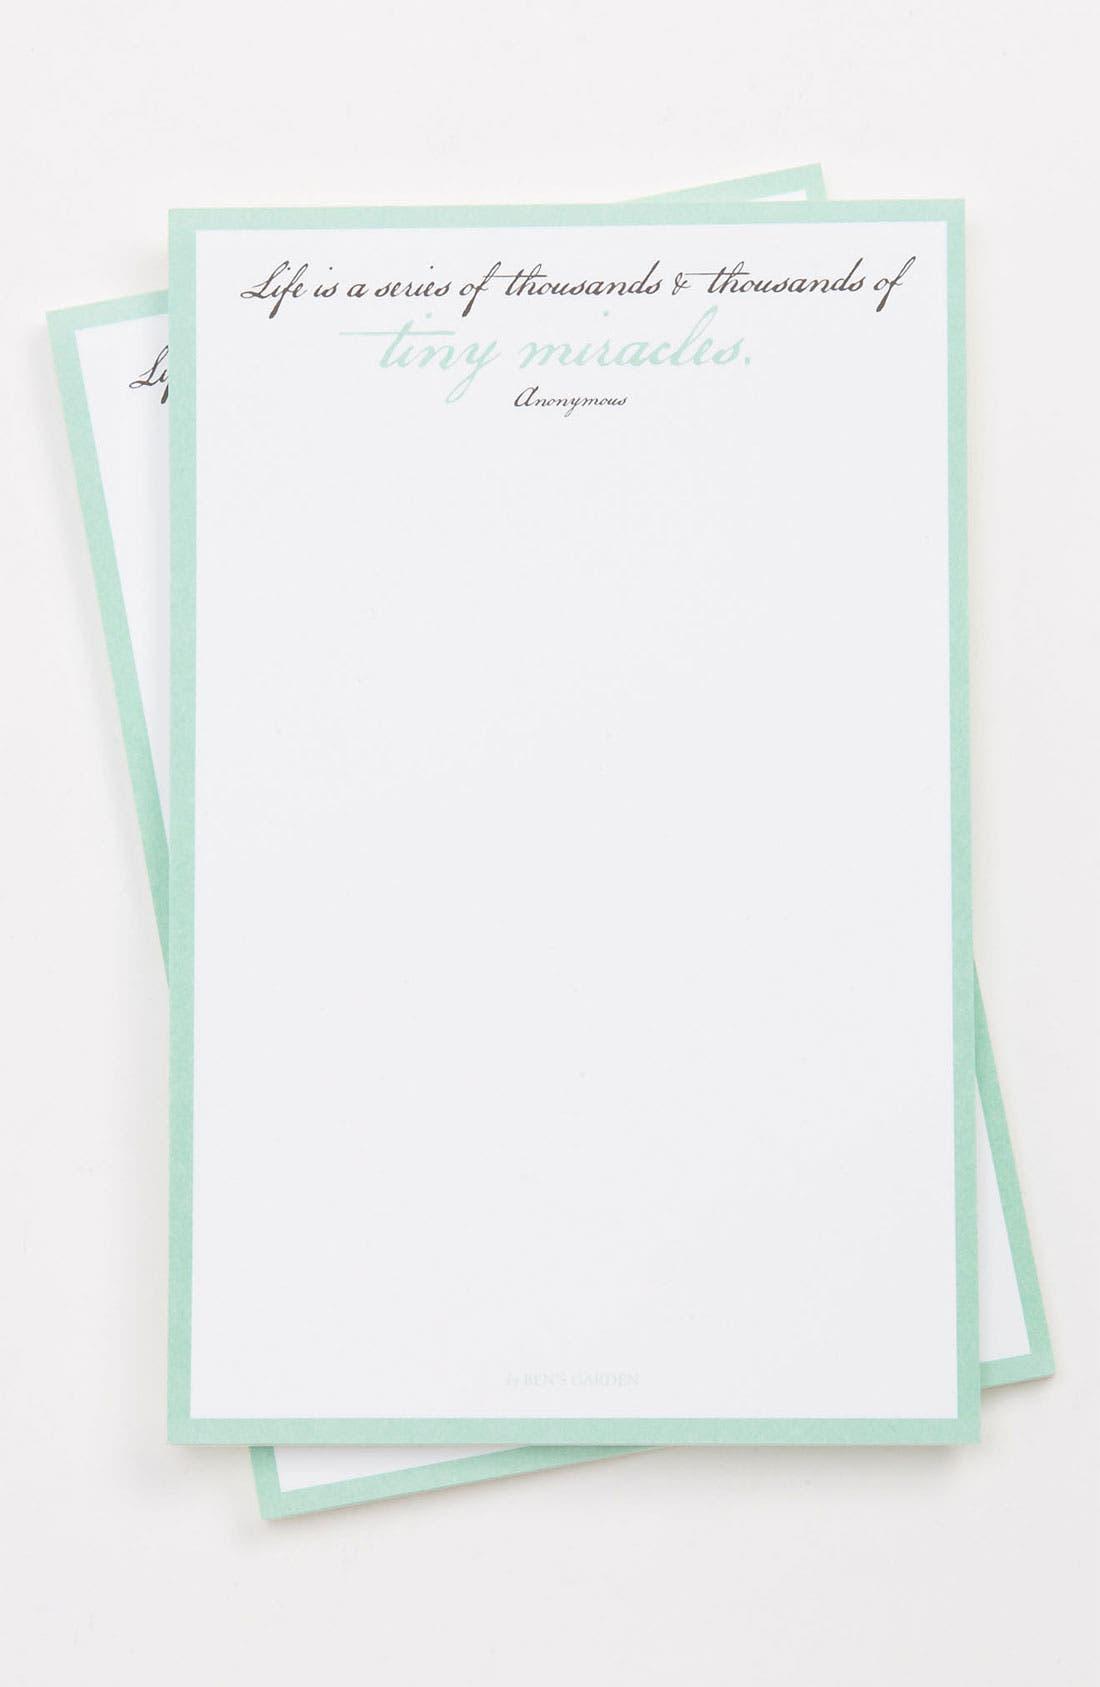 Main Image - Ben's Garden 'Tiny Miracles' Notepads (2-Pack)